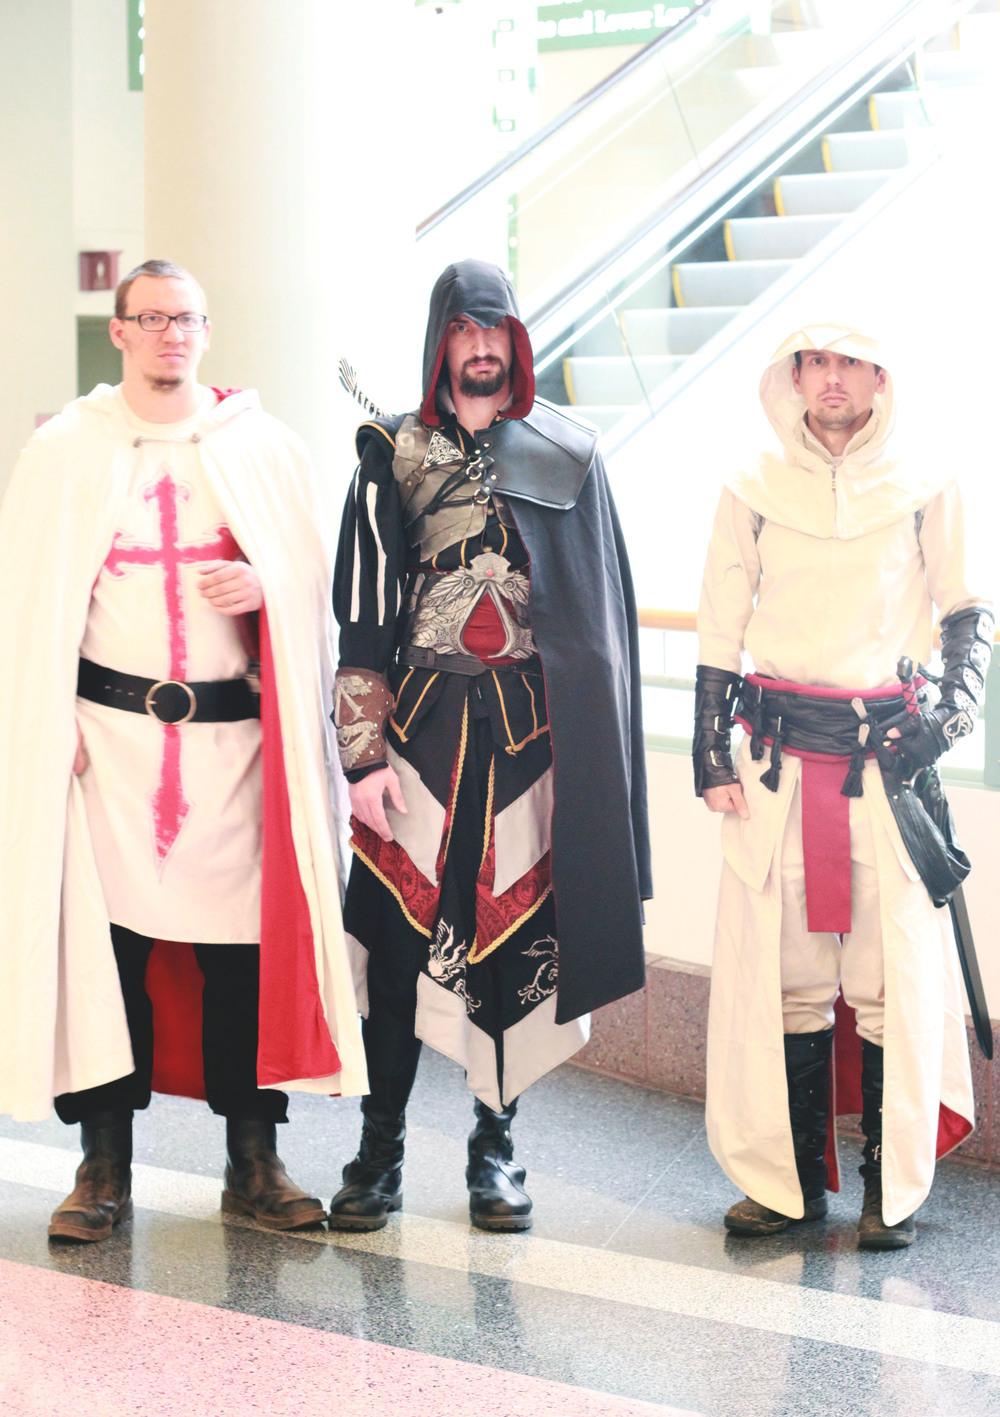 TOM + DEREK + DAVE | as The Knights Templar